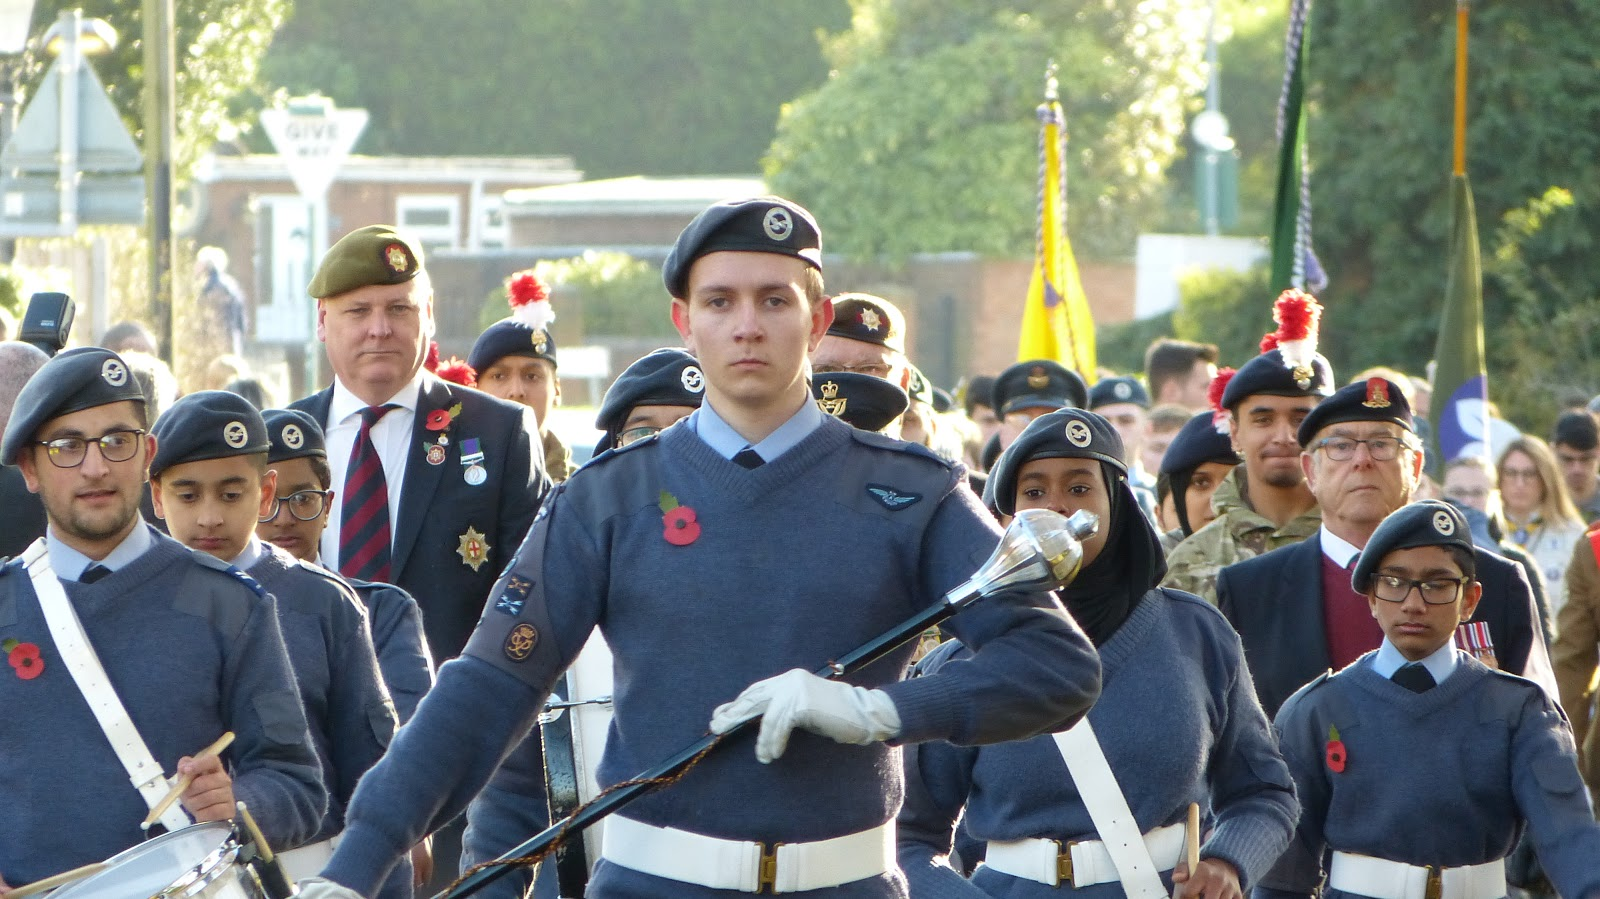 Remembrance parade 2019 in Castle Bromwich